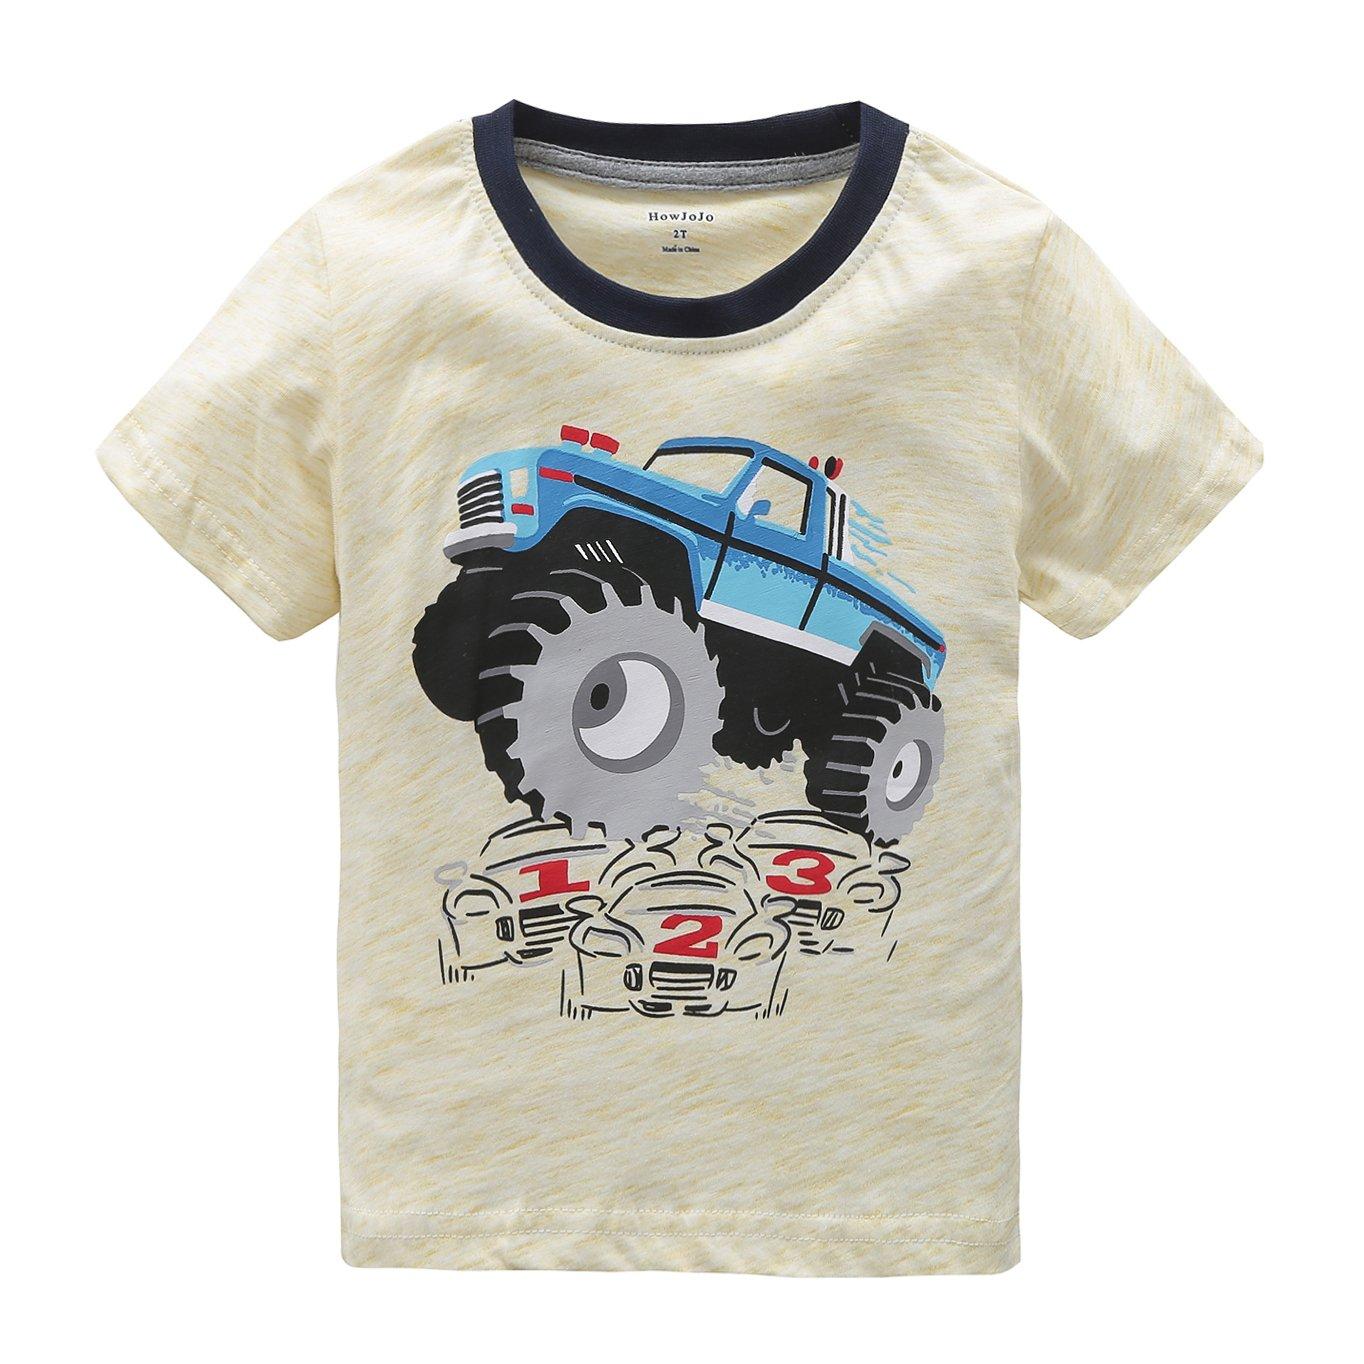 Boys Short Sleeve Cotton T-Shirt Monster Truck Summer Graphic Tees Beige 4T